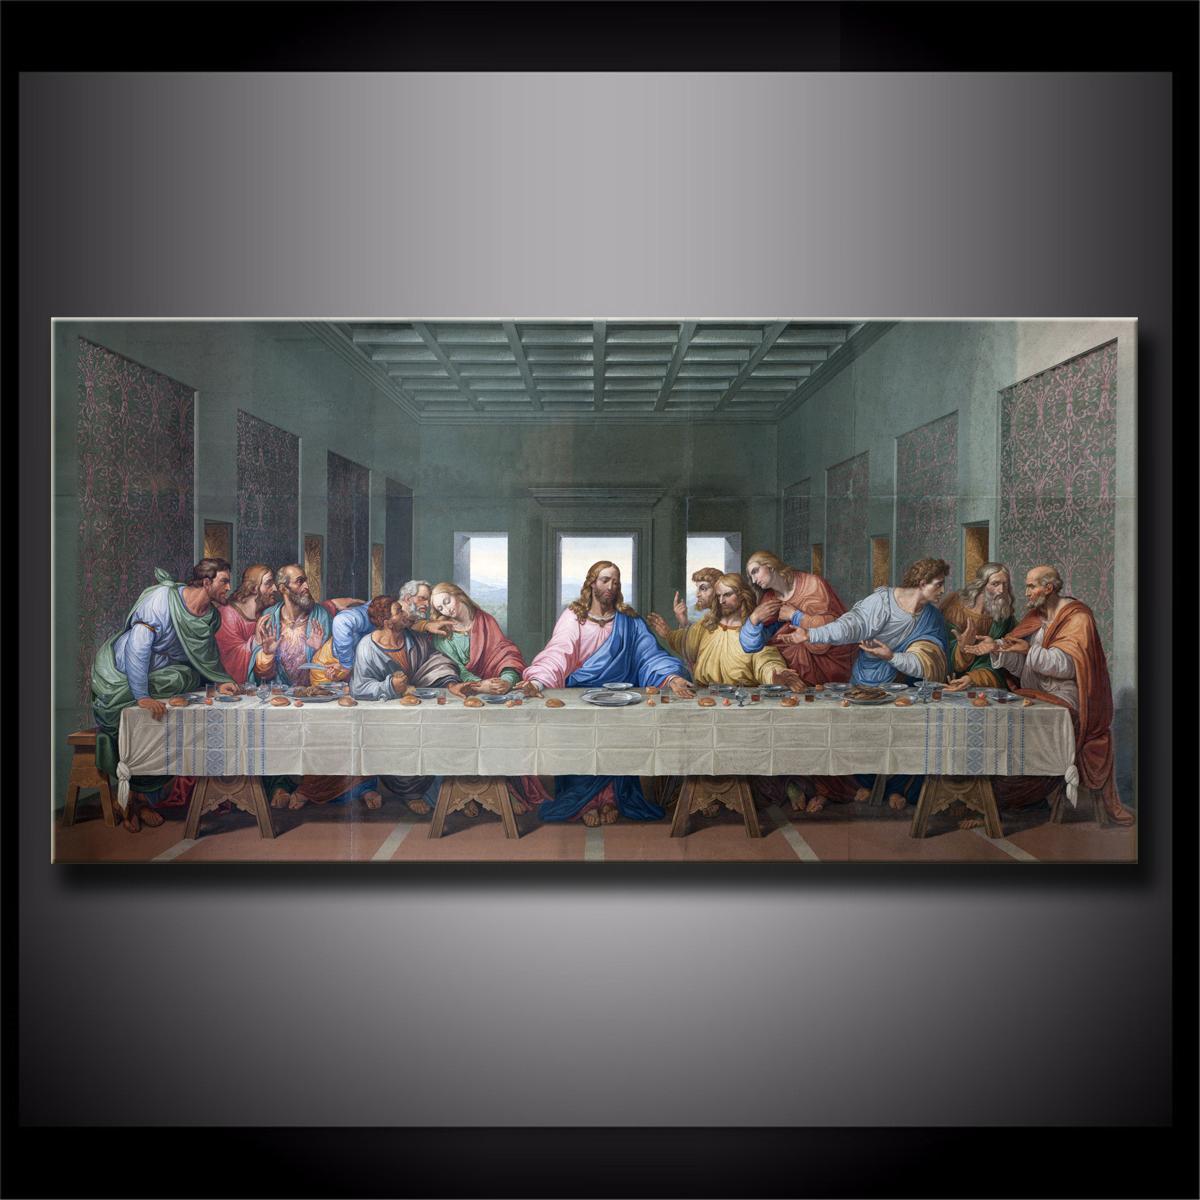 Unframed framed the last supper leonardo da vincilast supperjesus1 pieces canvas prints wall art oil painting home decor 24x48